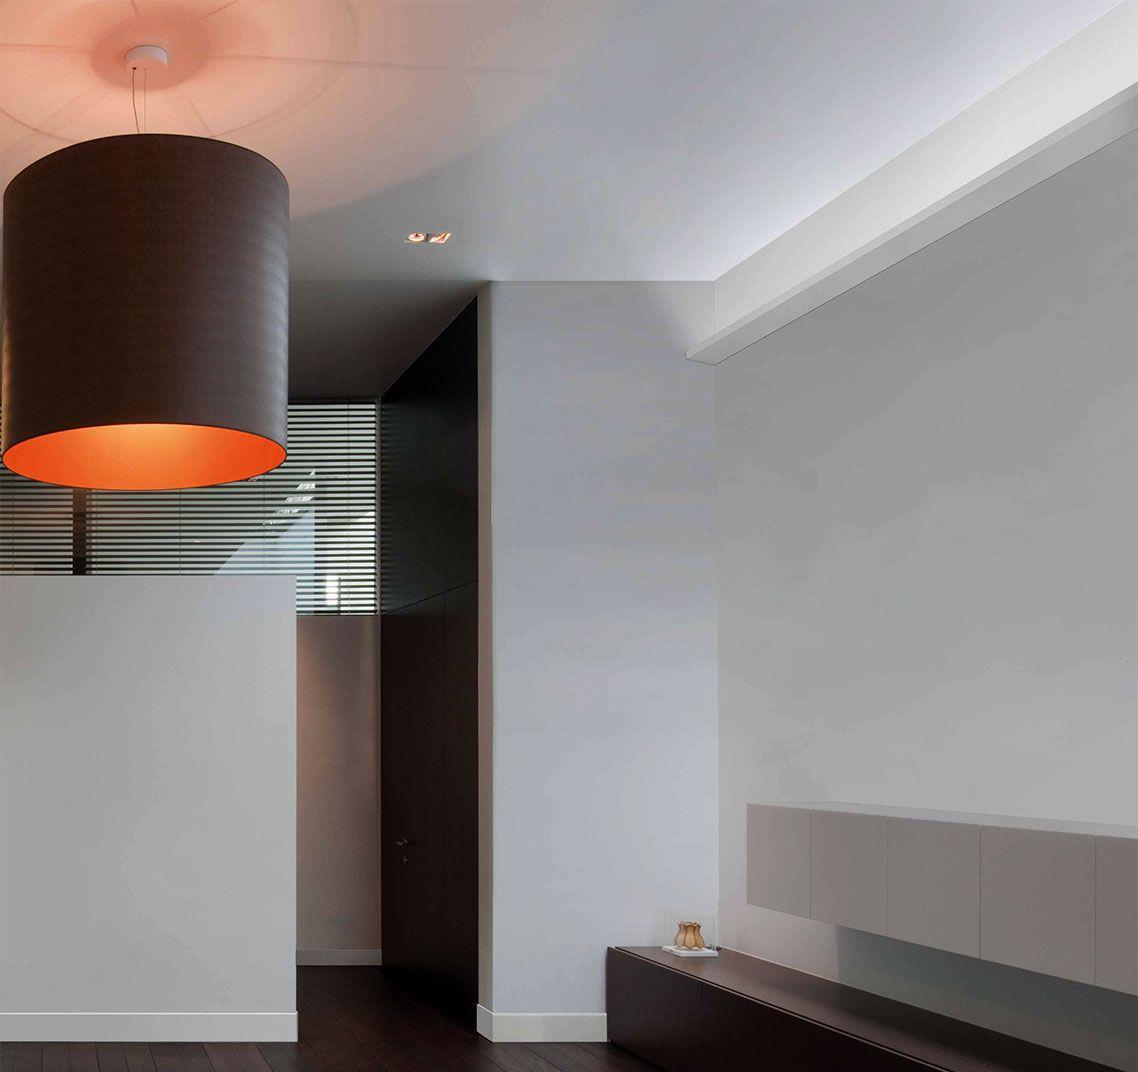 Large Aventura Molding For Indirect Lighting Inviting Home False Ceiling Living Room False Ceiling Bedroom Modern Interior Decor